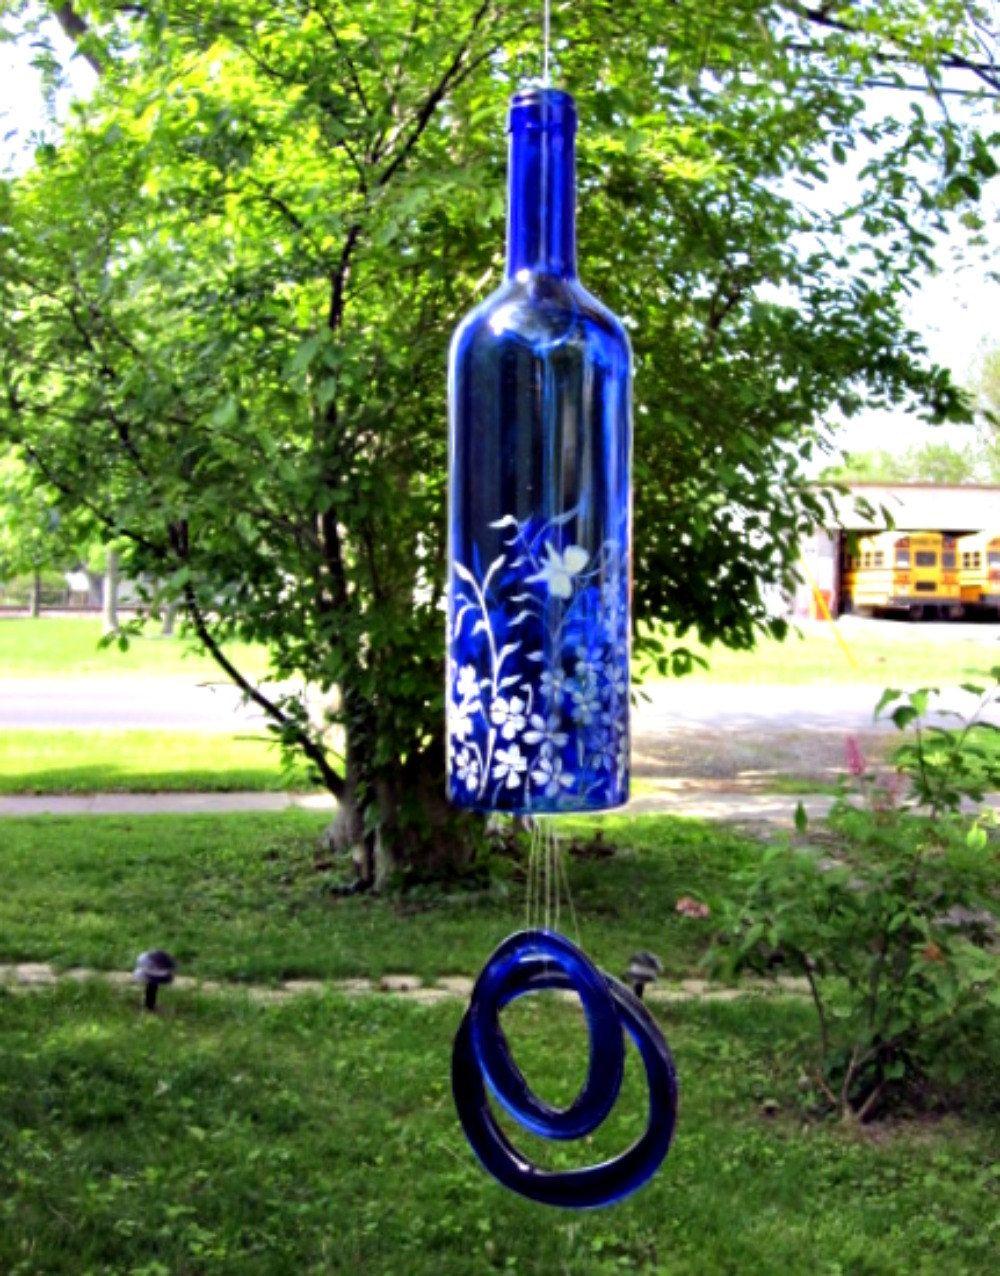 Wine bottle crafts outdoor - Recycled Blue Wine Bottle Garden Wind Chimes Bell Style Garden In White